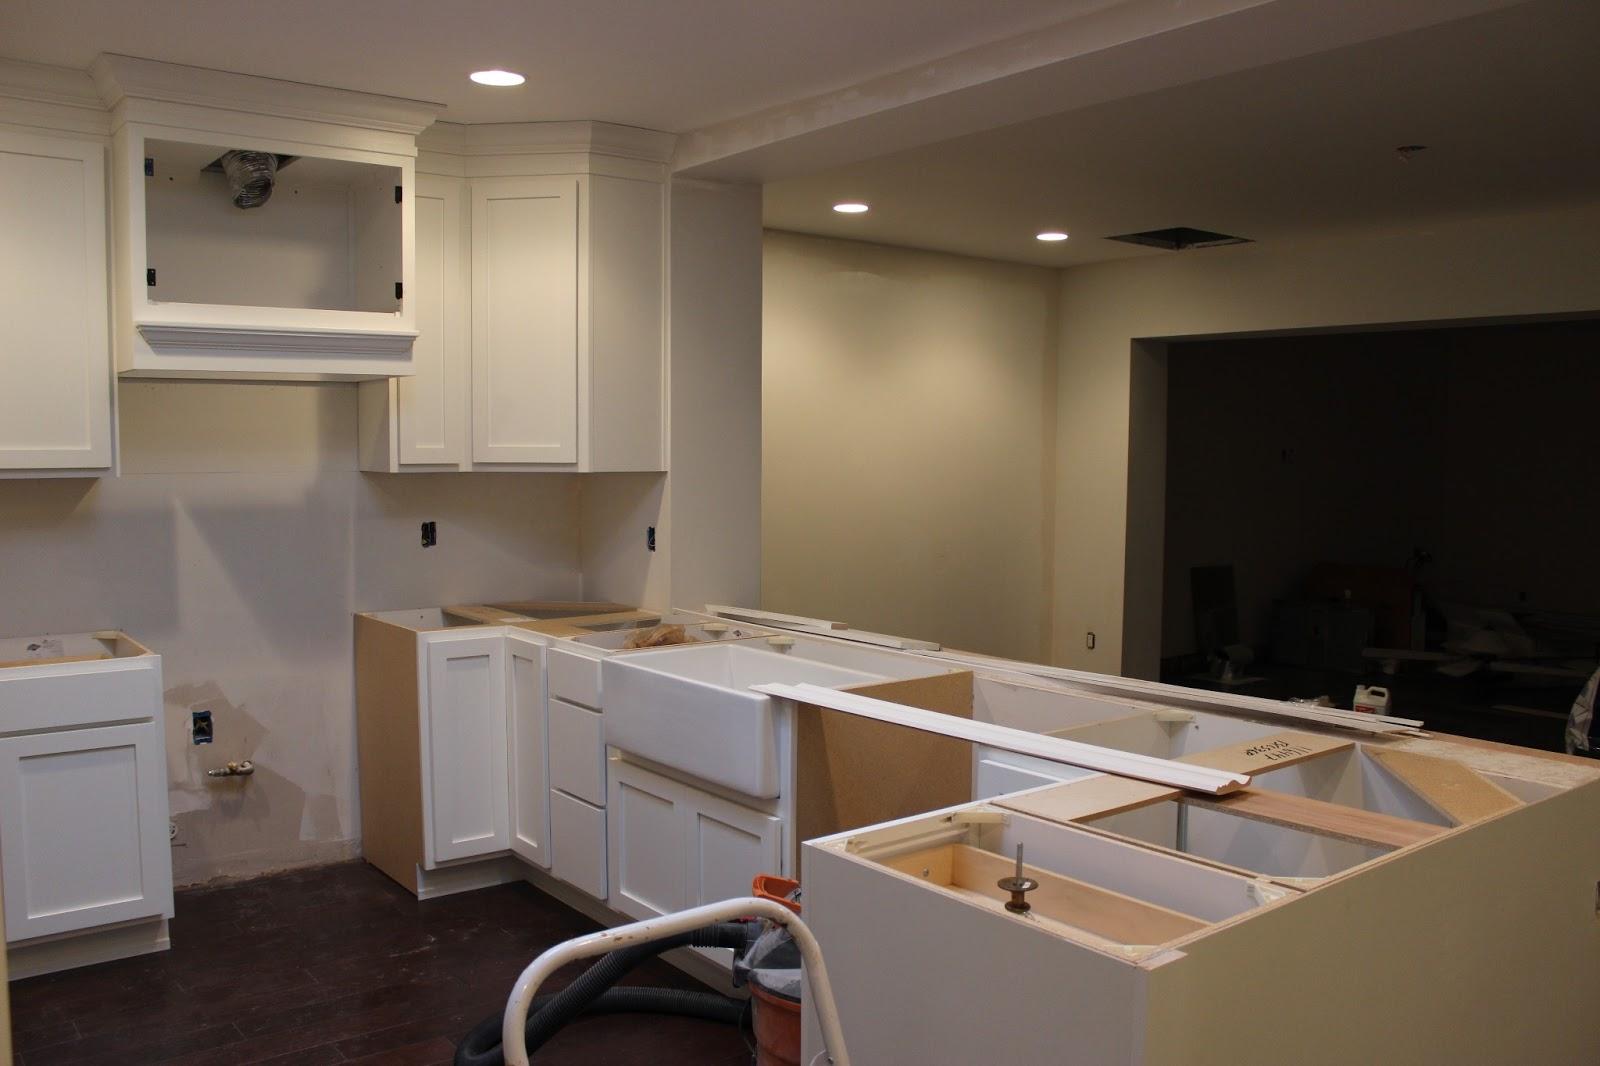 New House Update Kitchen Cabinets Dream Book Design